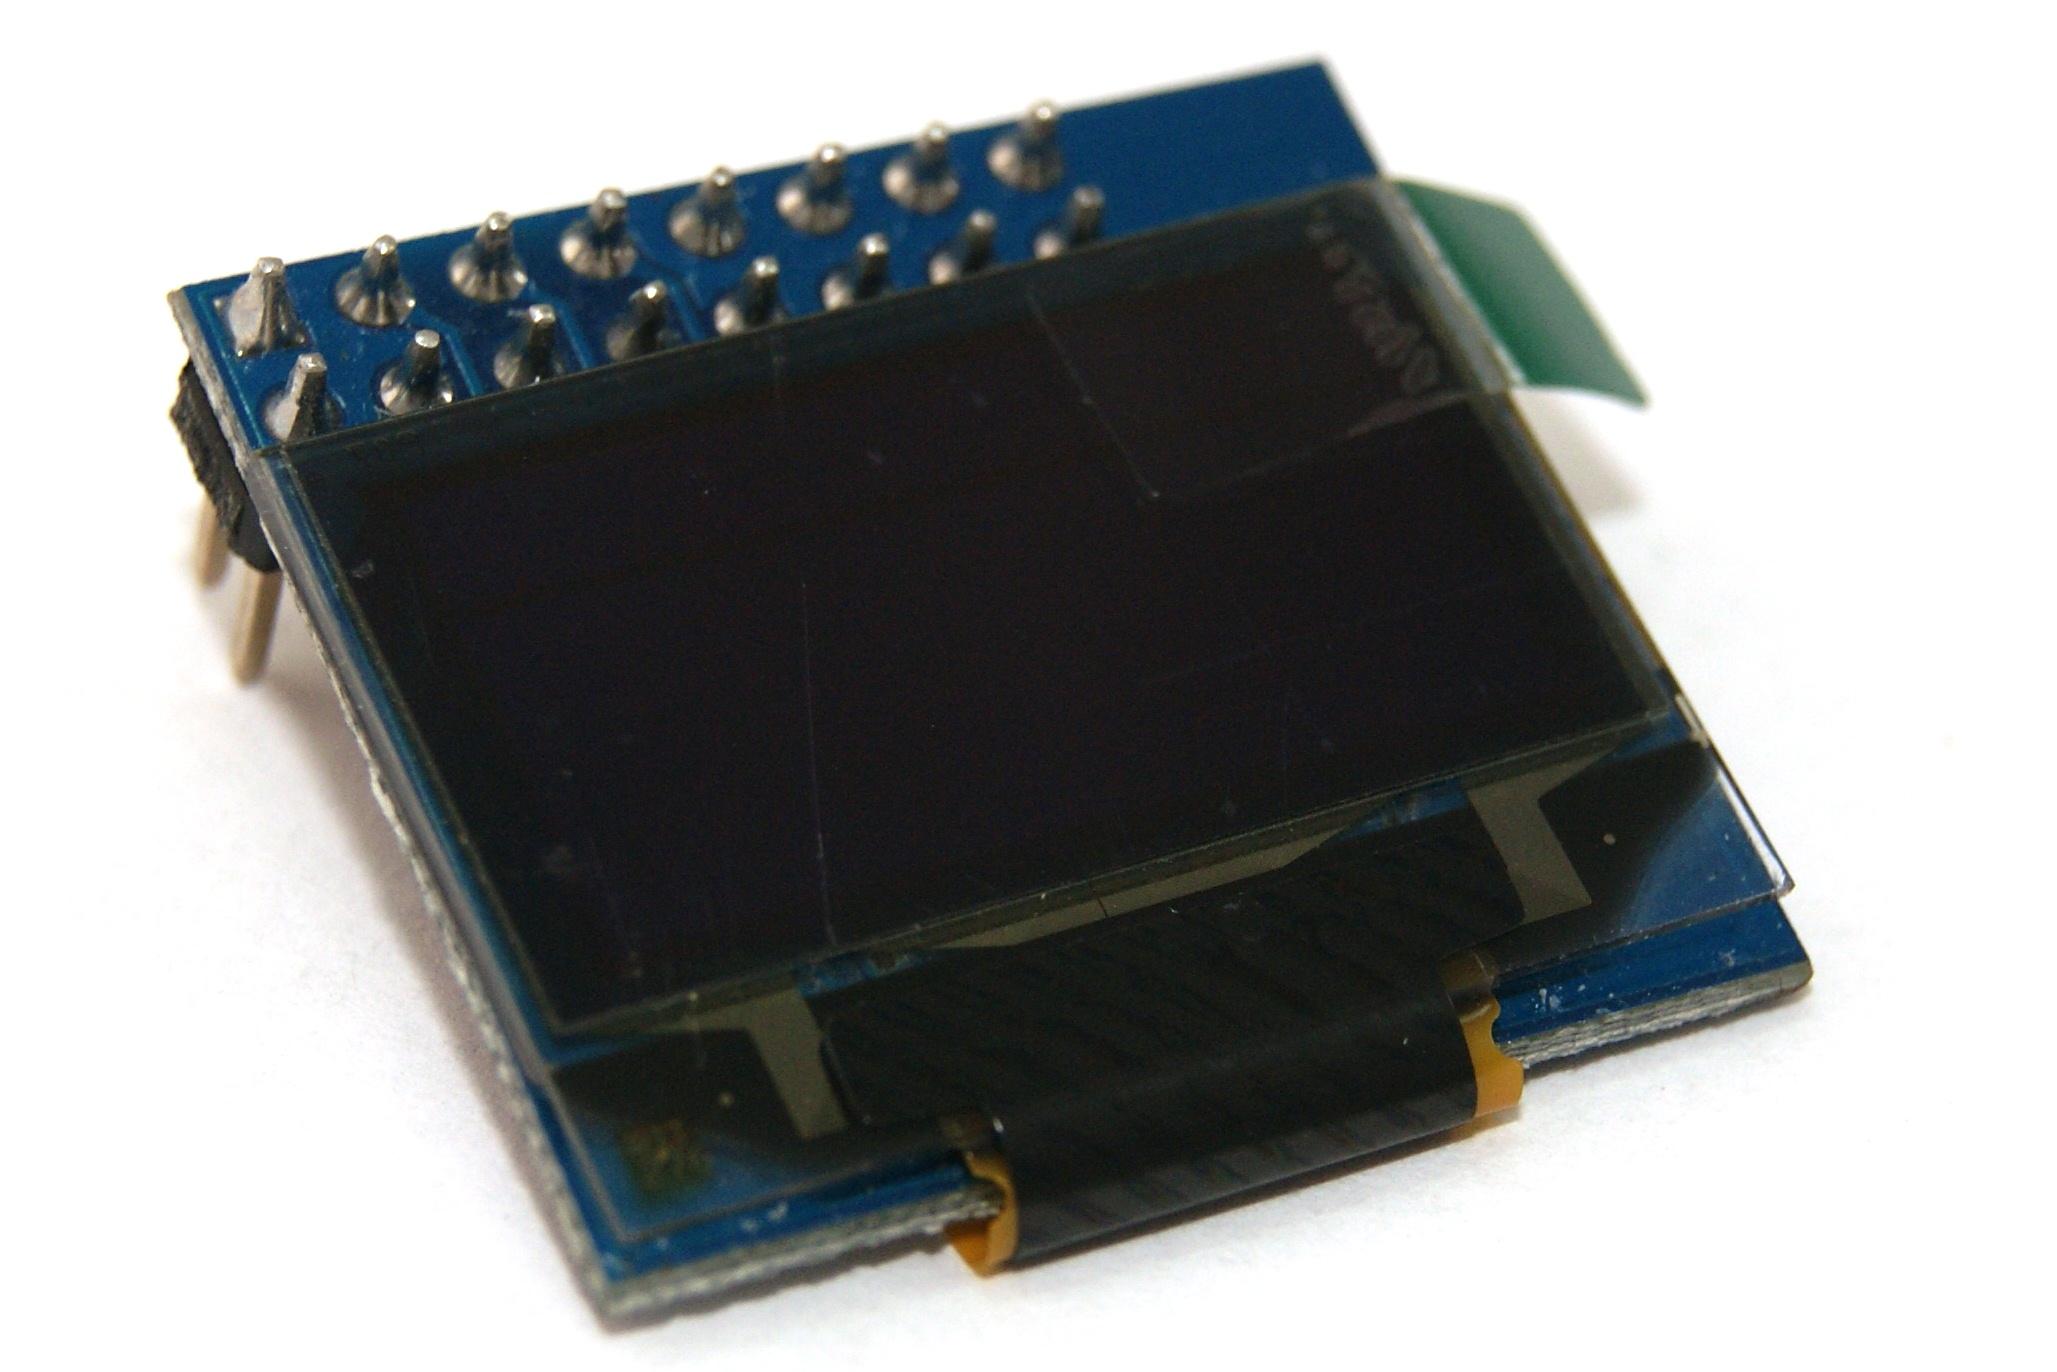 "Pantalla OLED LCD Amarillo-Azul 128x64 0.96"" I2C SPI"